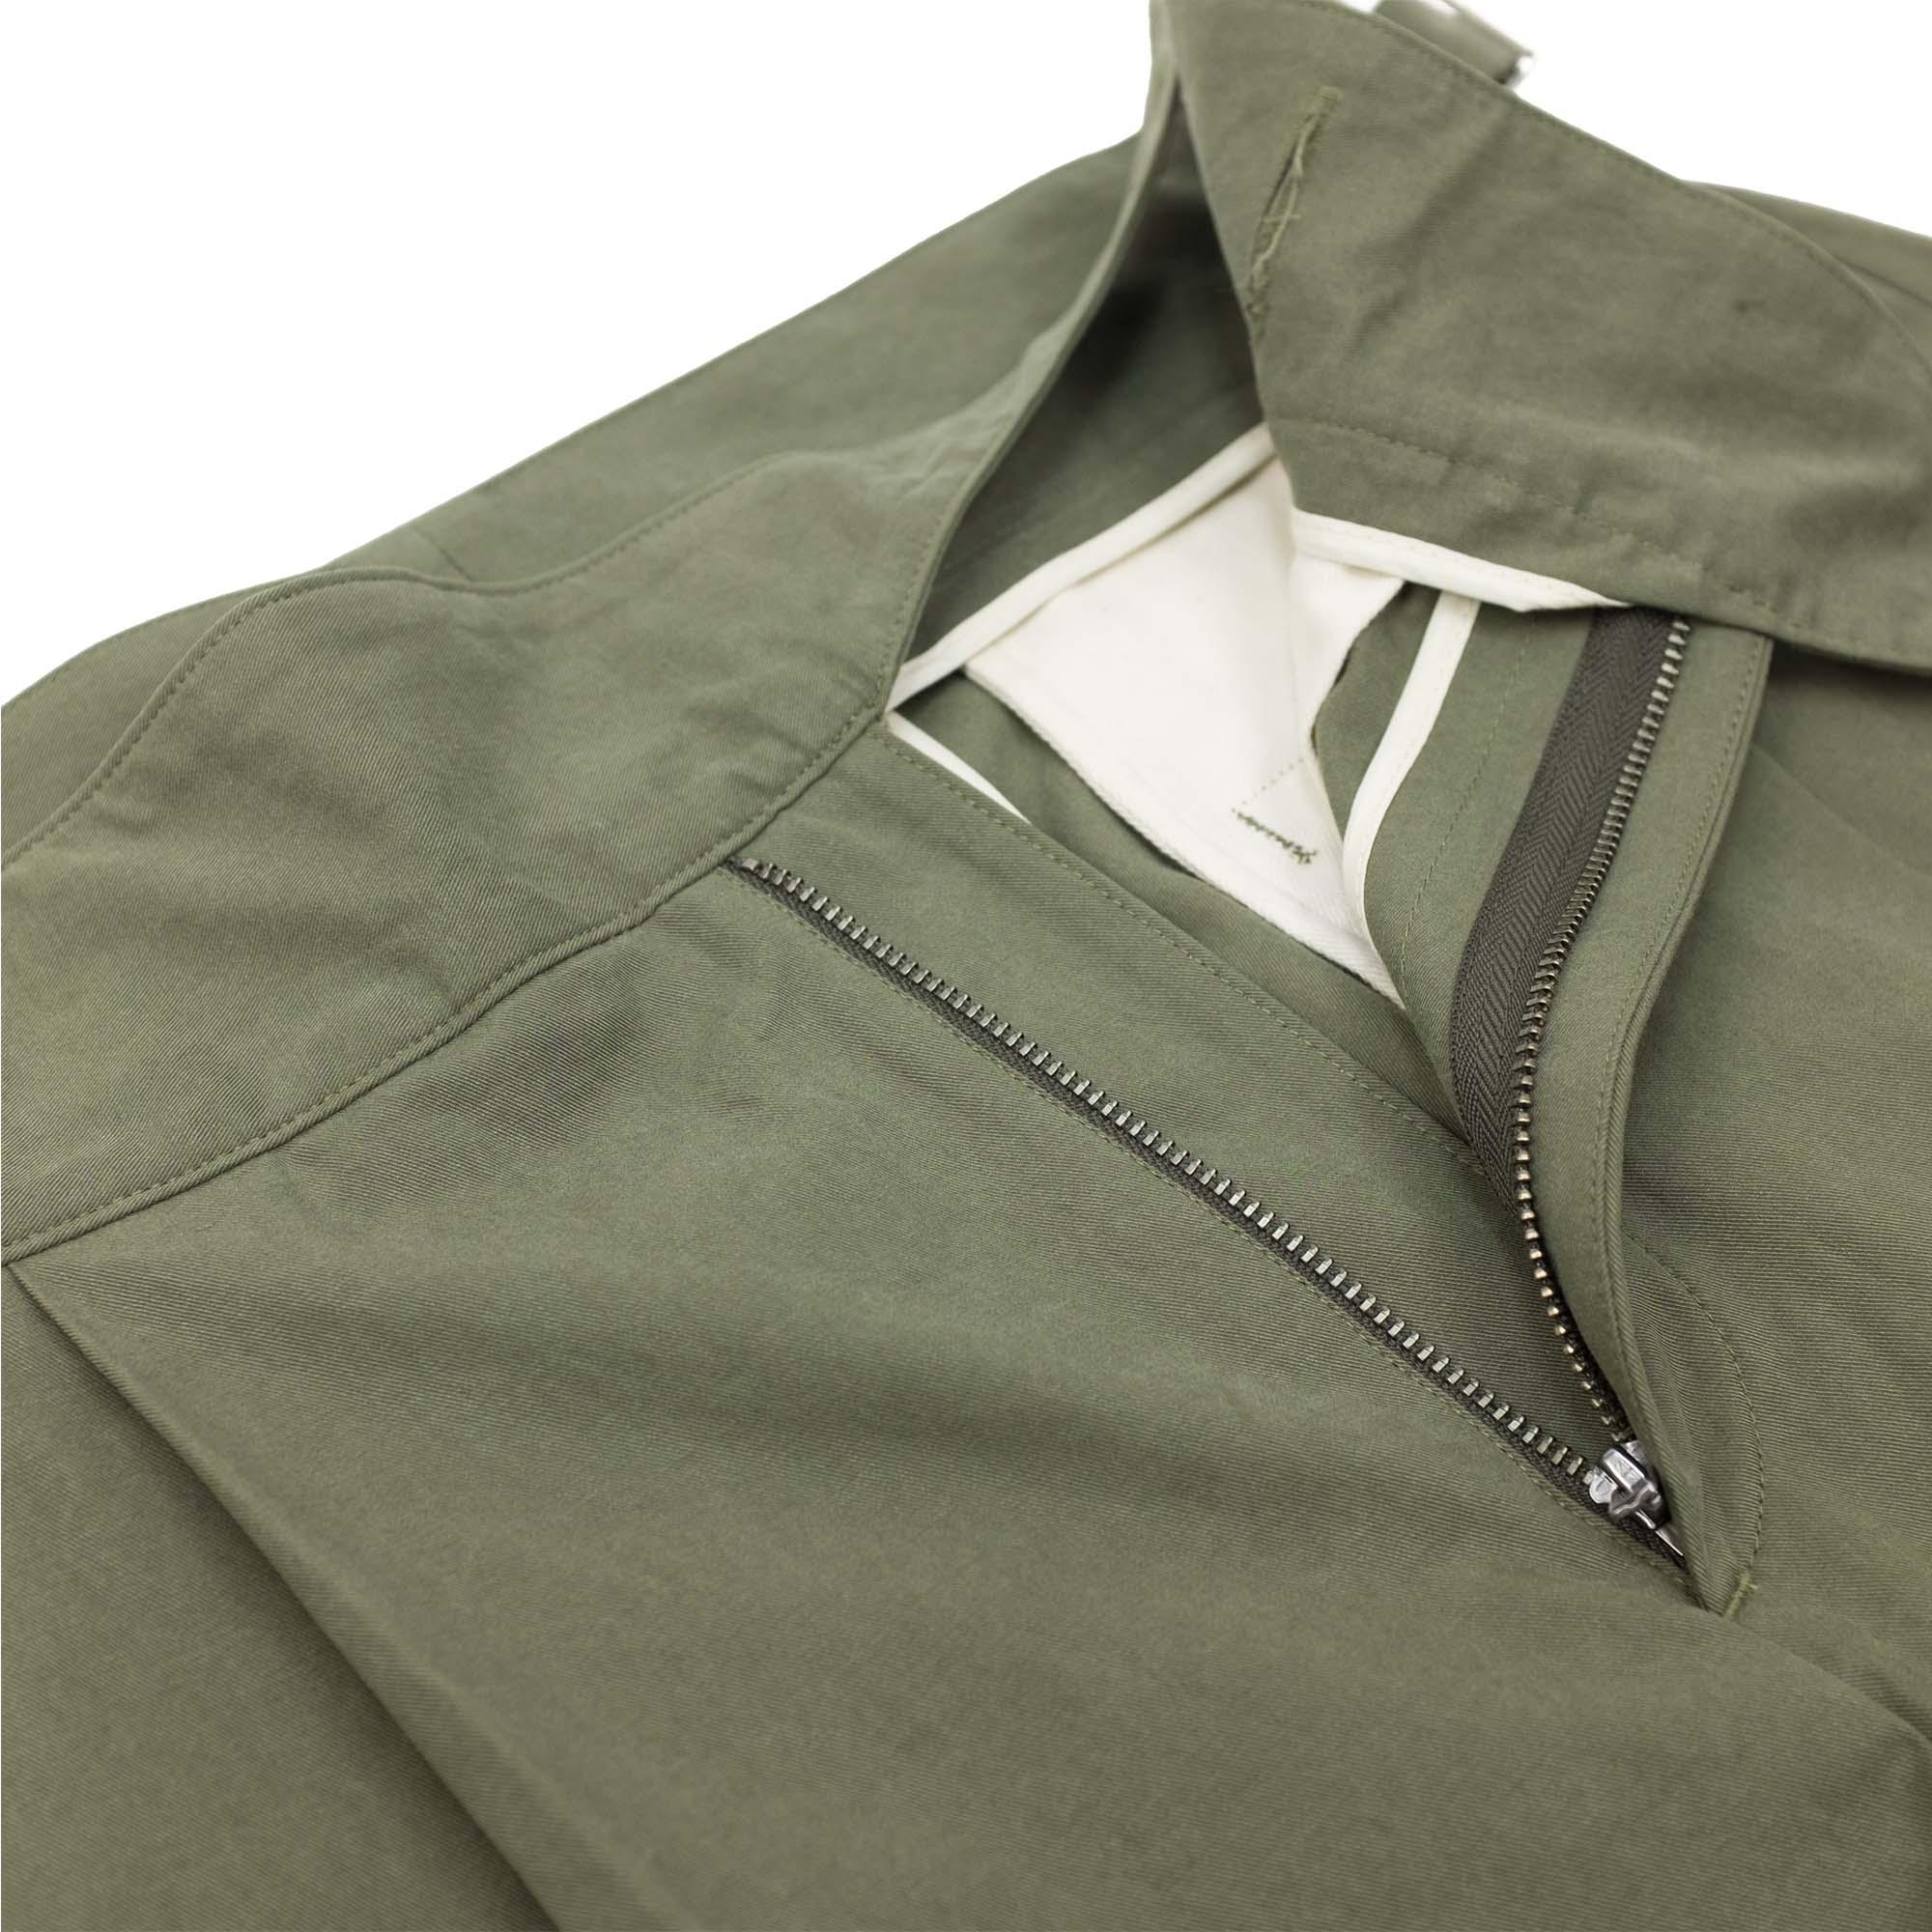 Kuro Sulfur Dyed NIDOM Gurkha Pants - Khaki